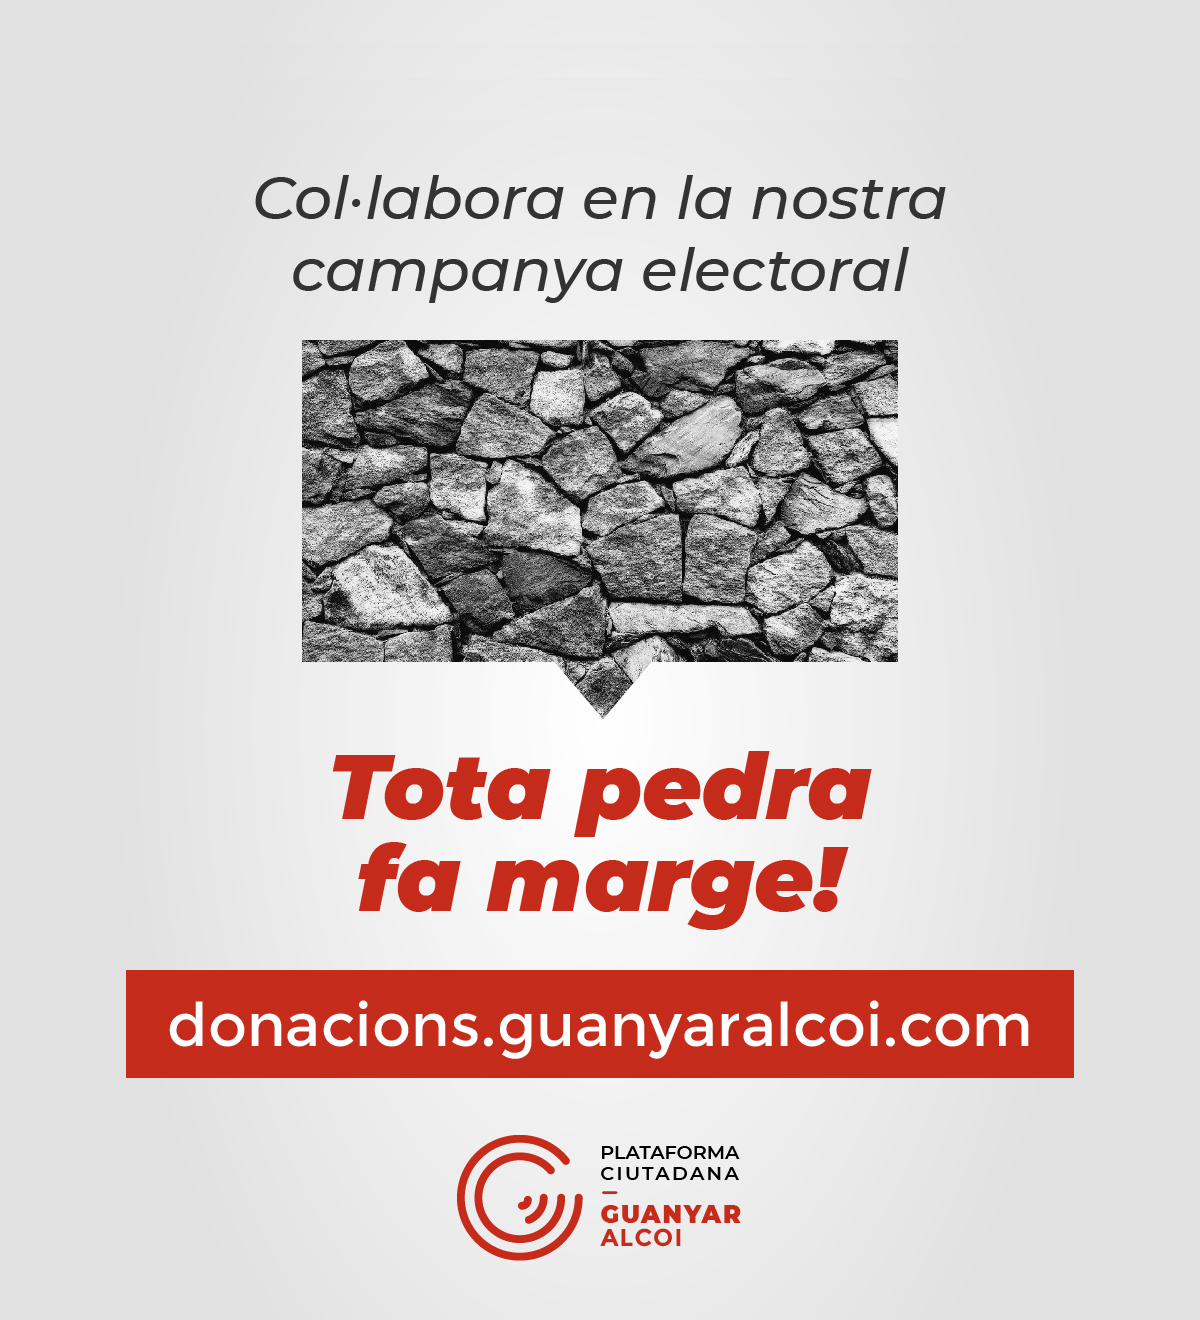 donacions